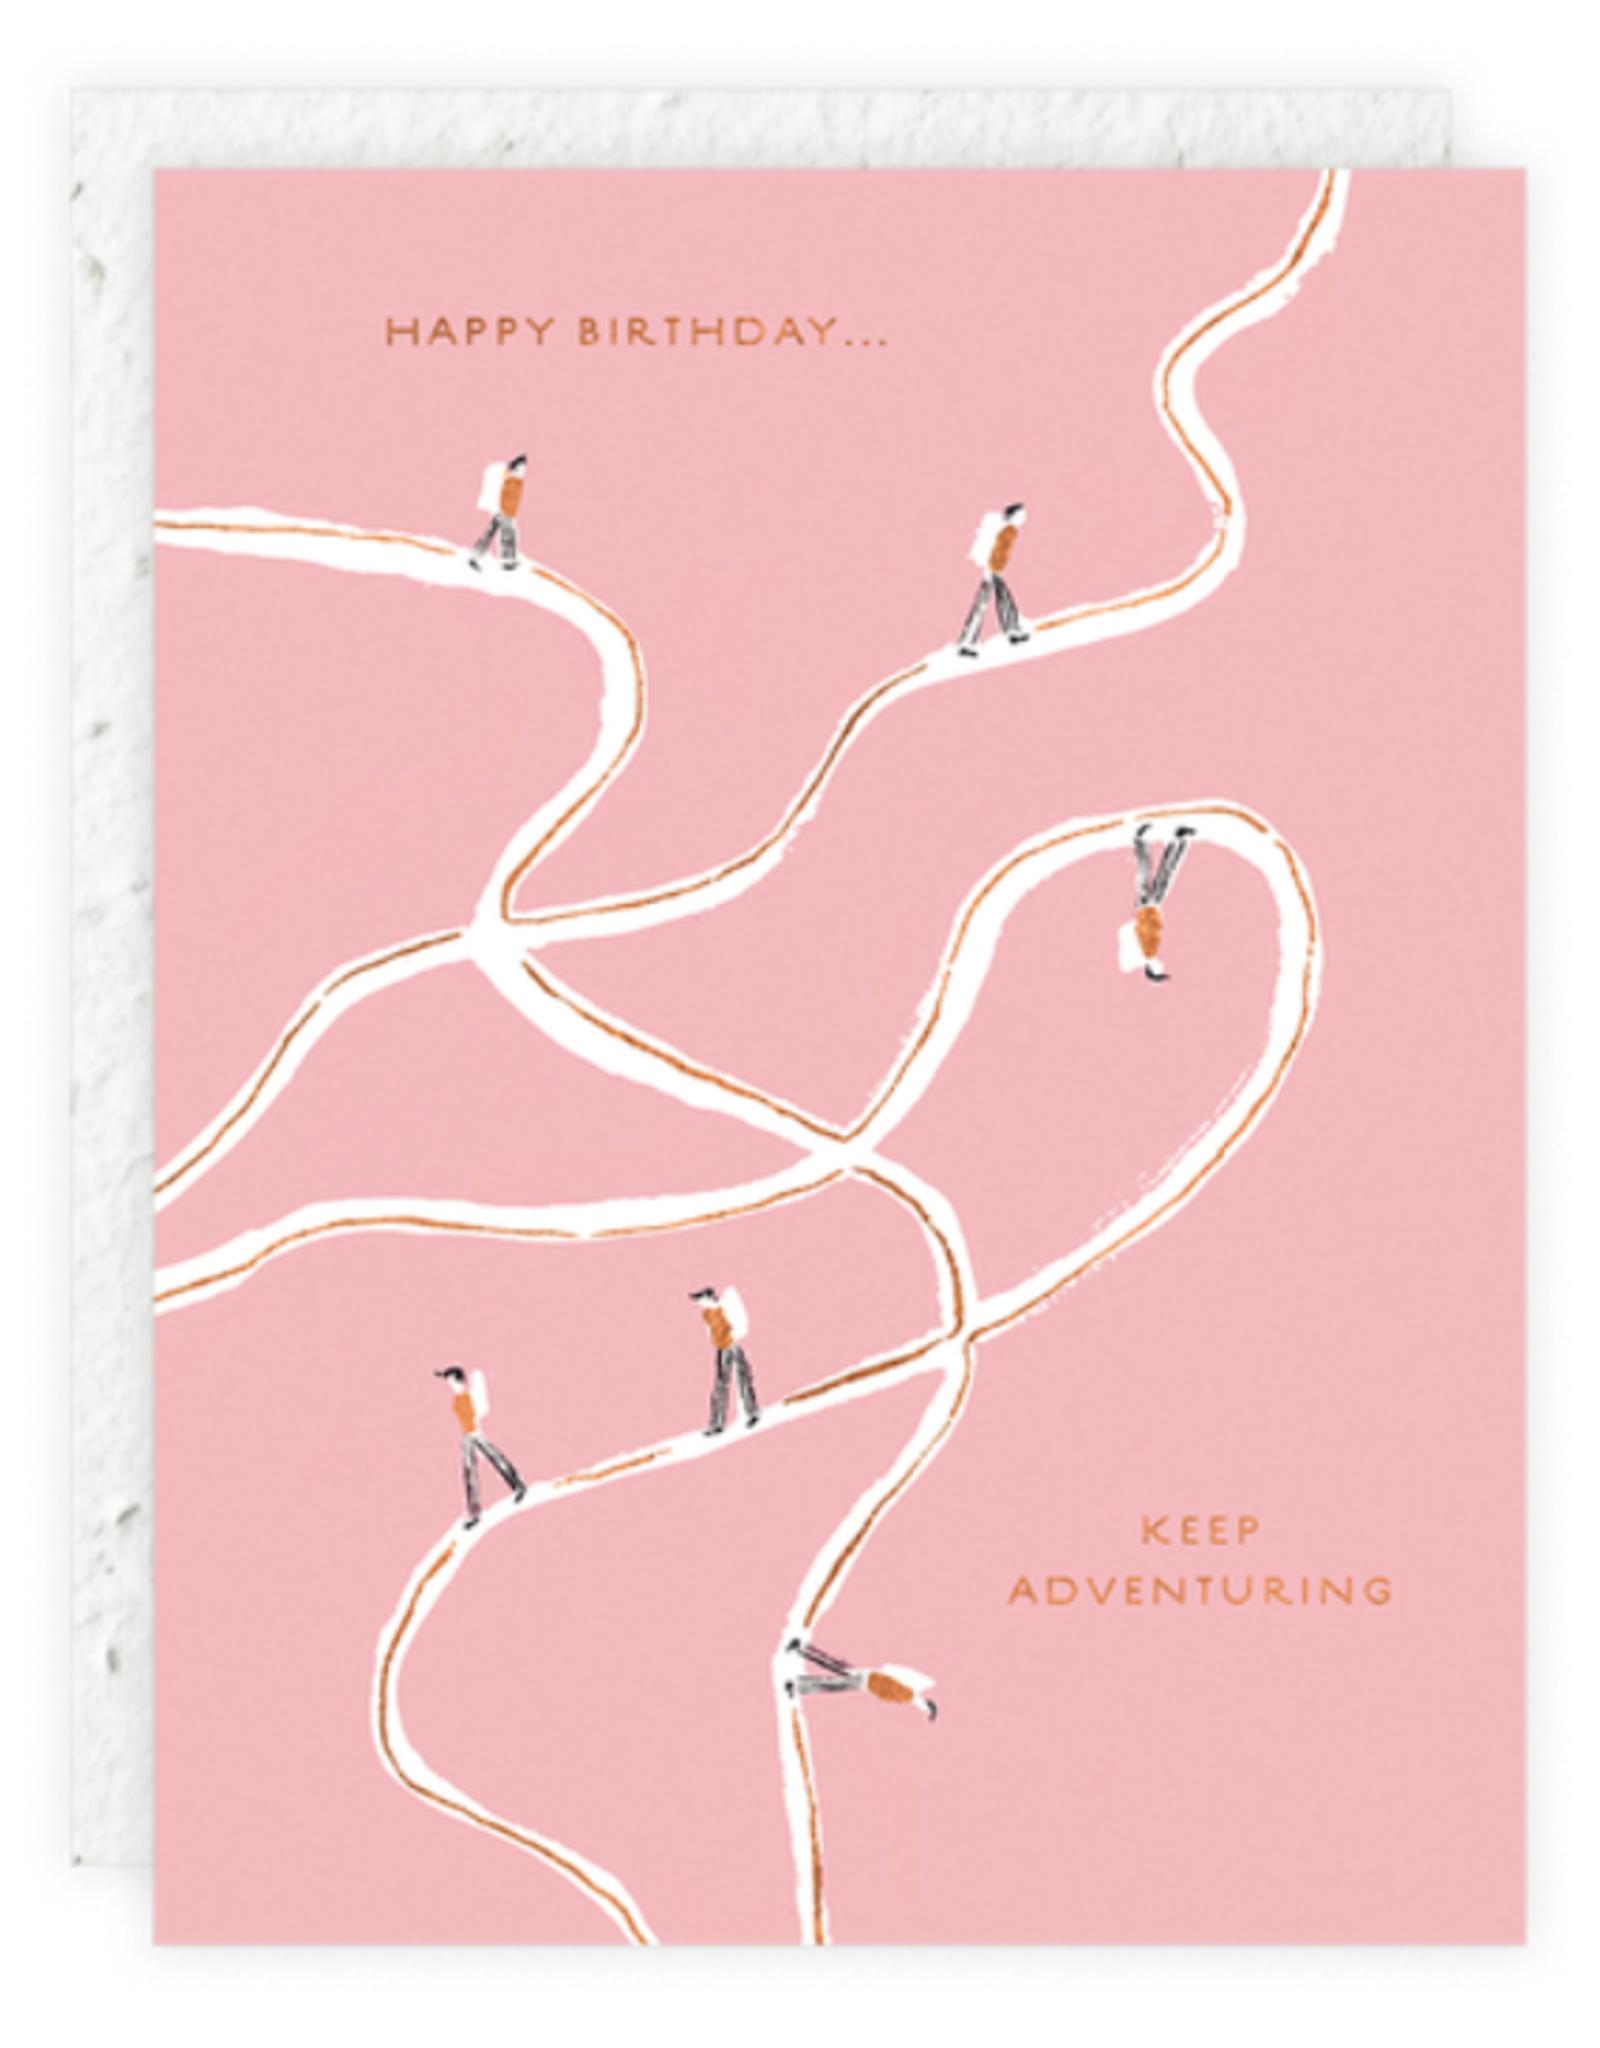 Keep Adventuring Birthday Card